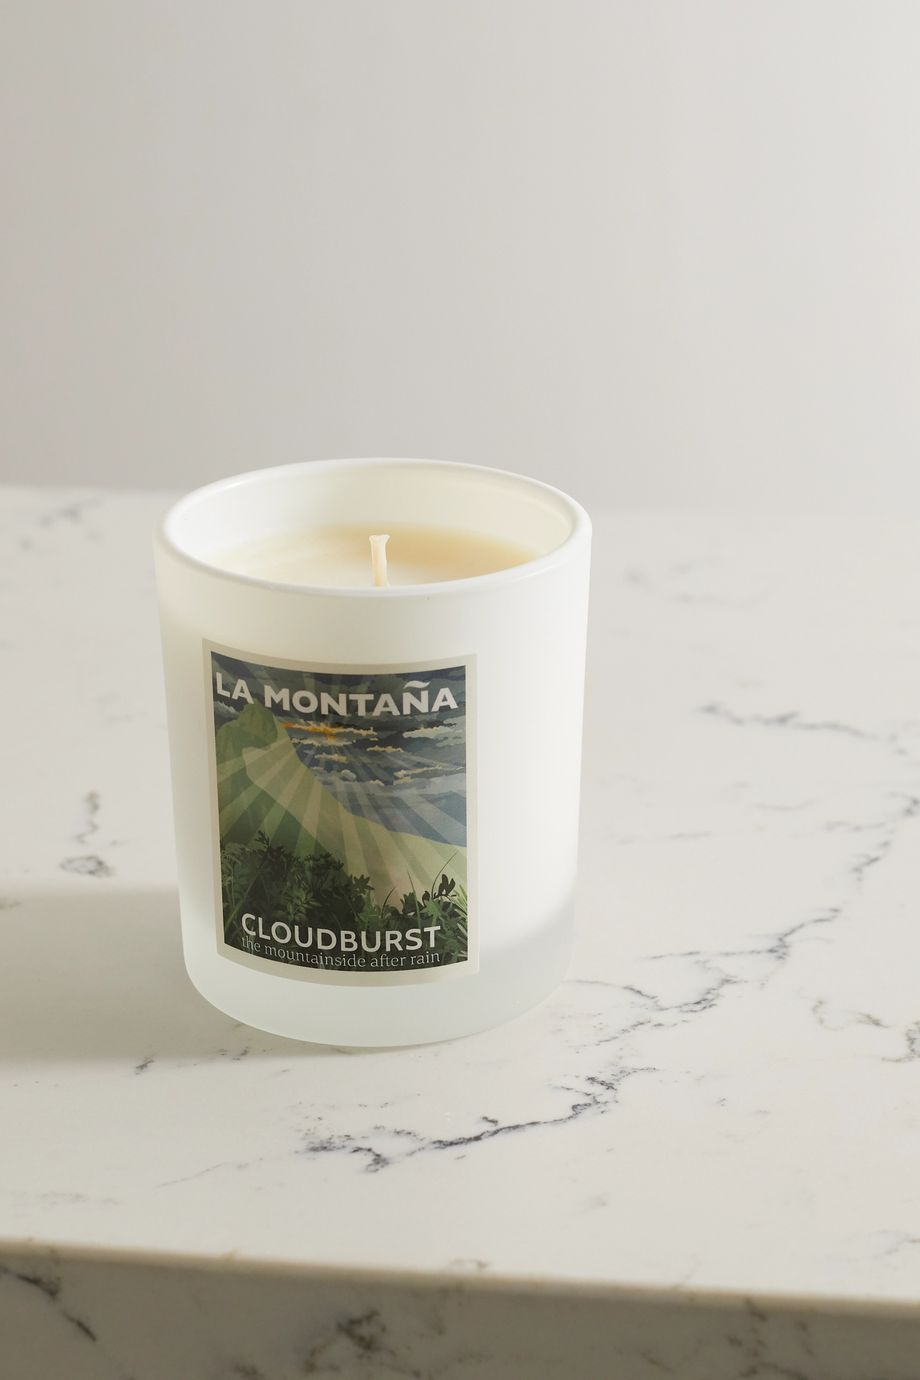 La Montaña Cloudburst Candle, 220g